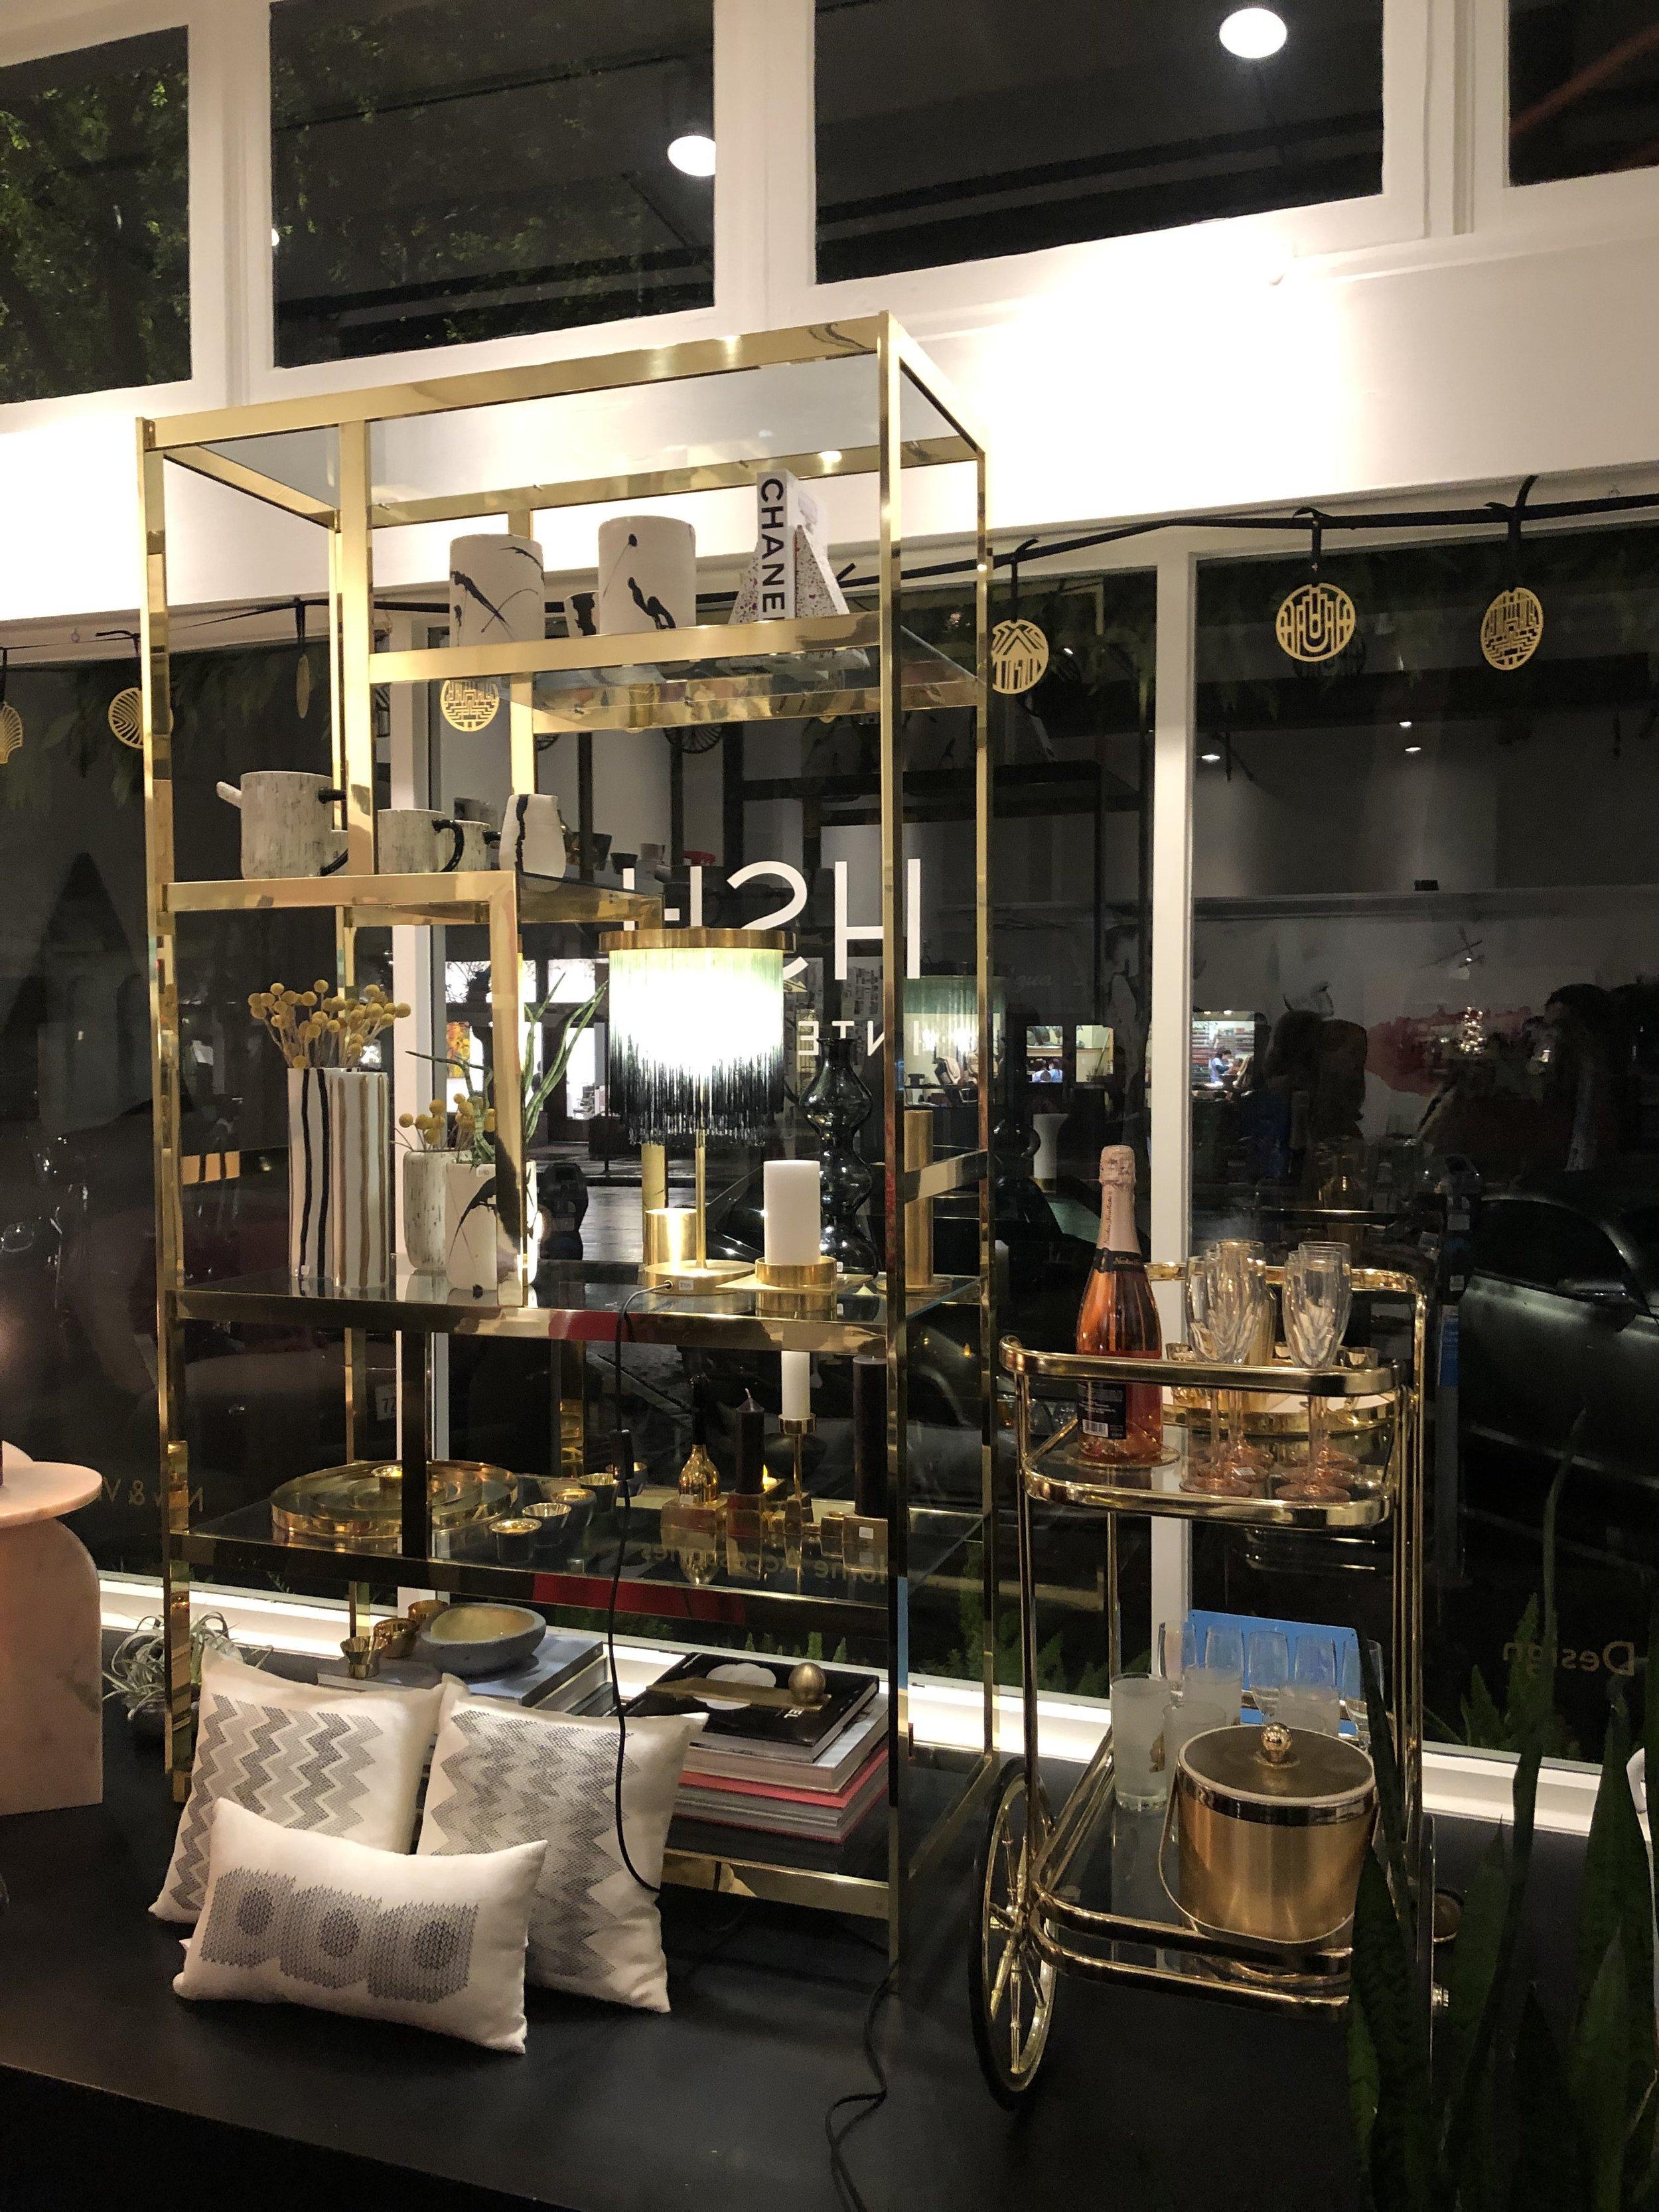 HSH Interiors' storefront